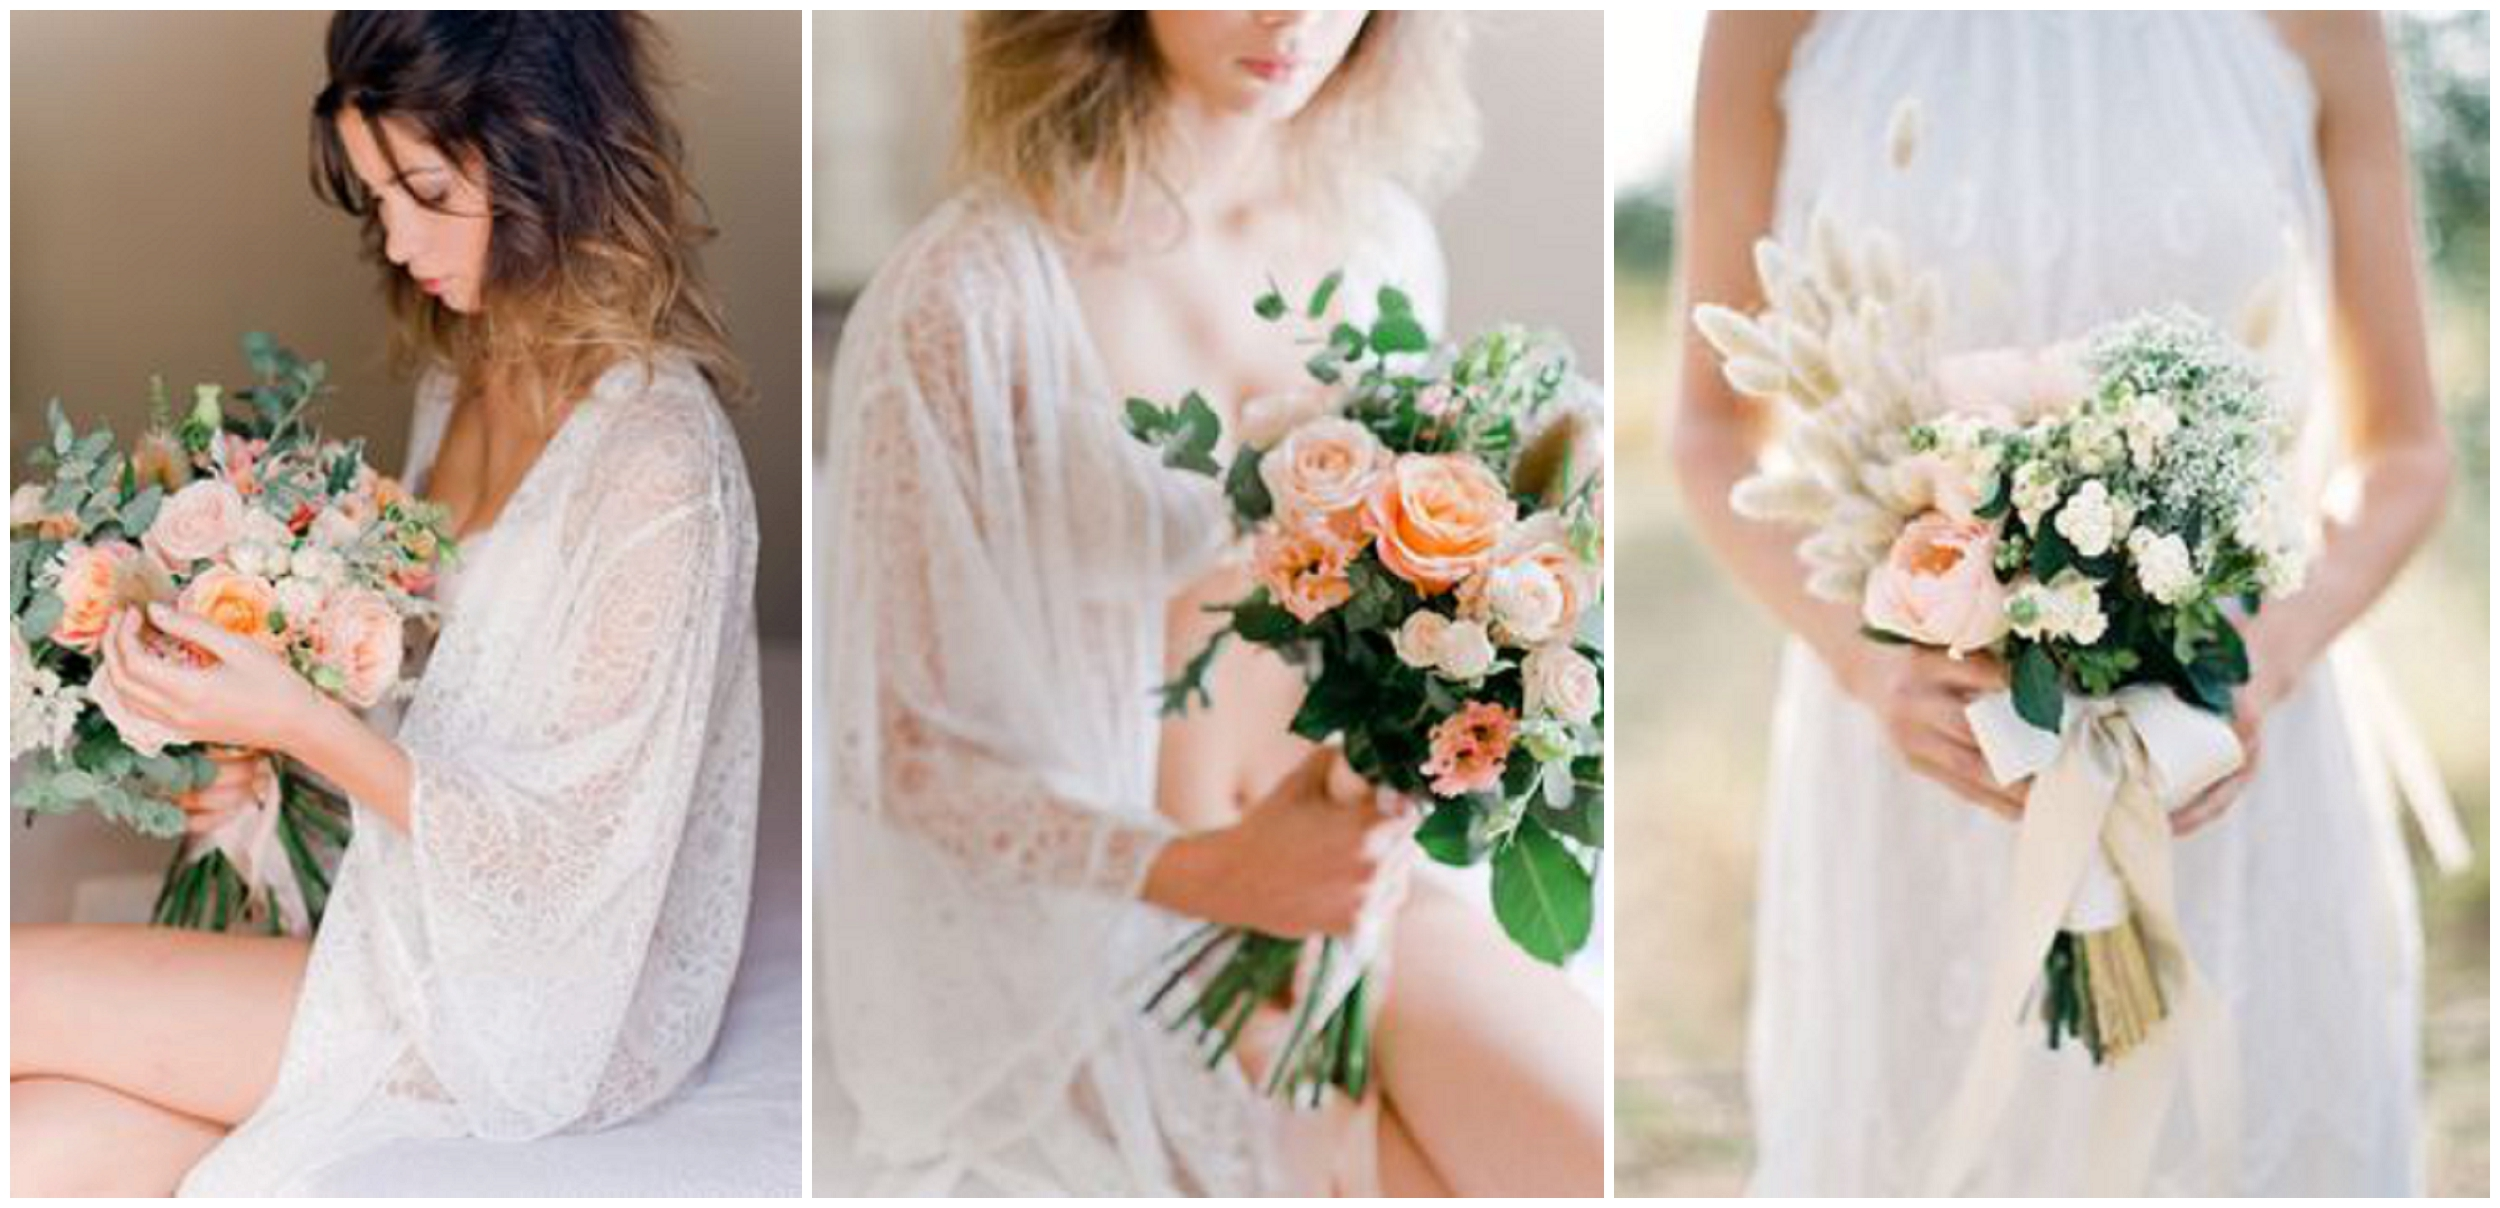 maria+rao+wedding+photographer+portugal_0169.jpg